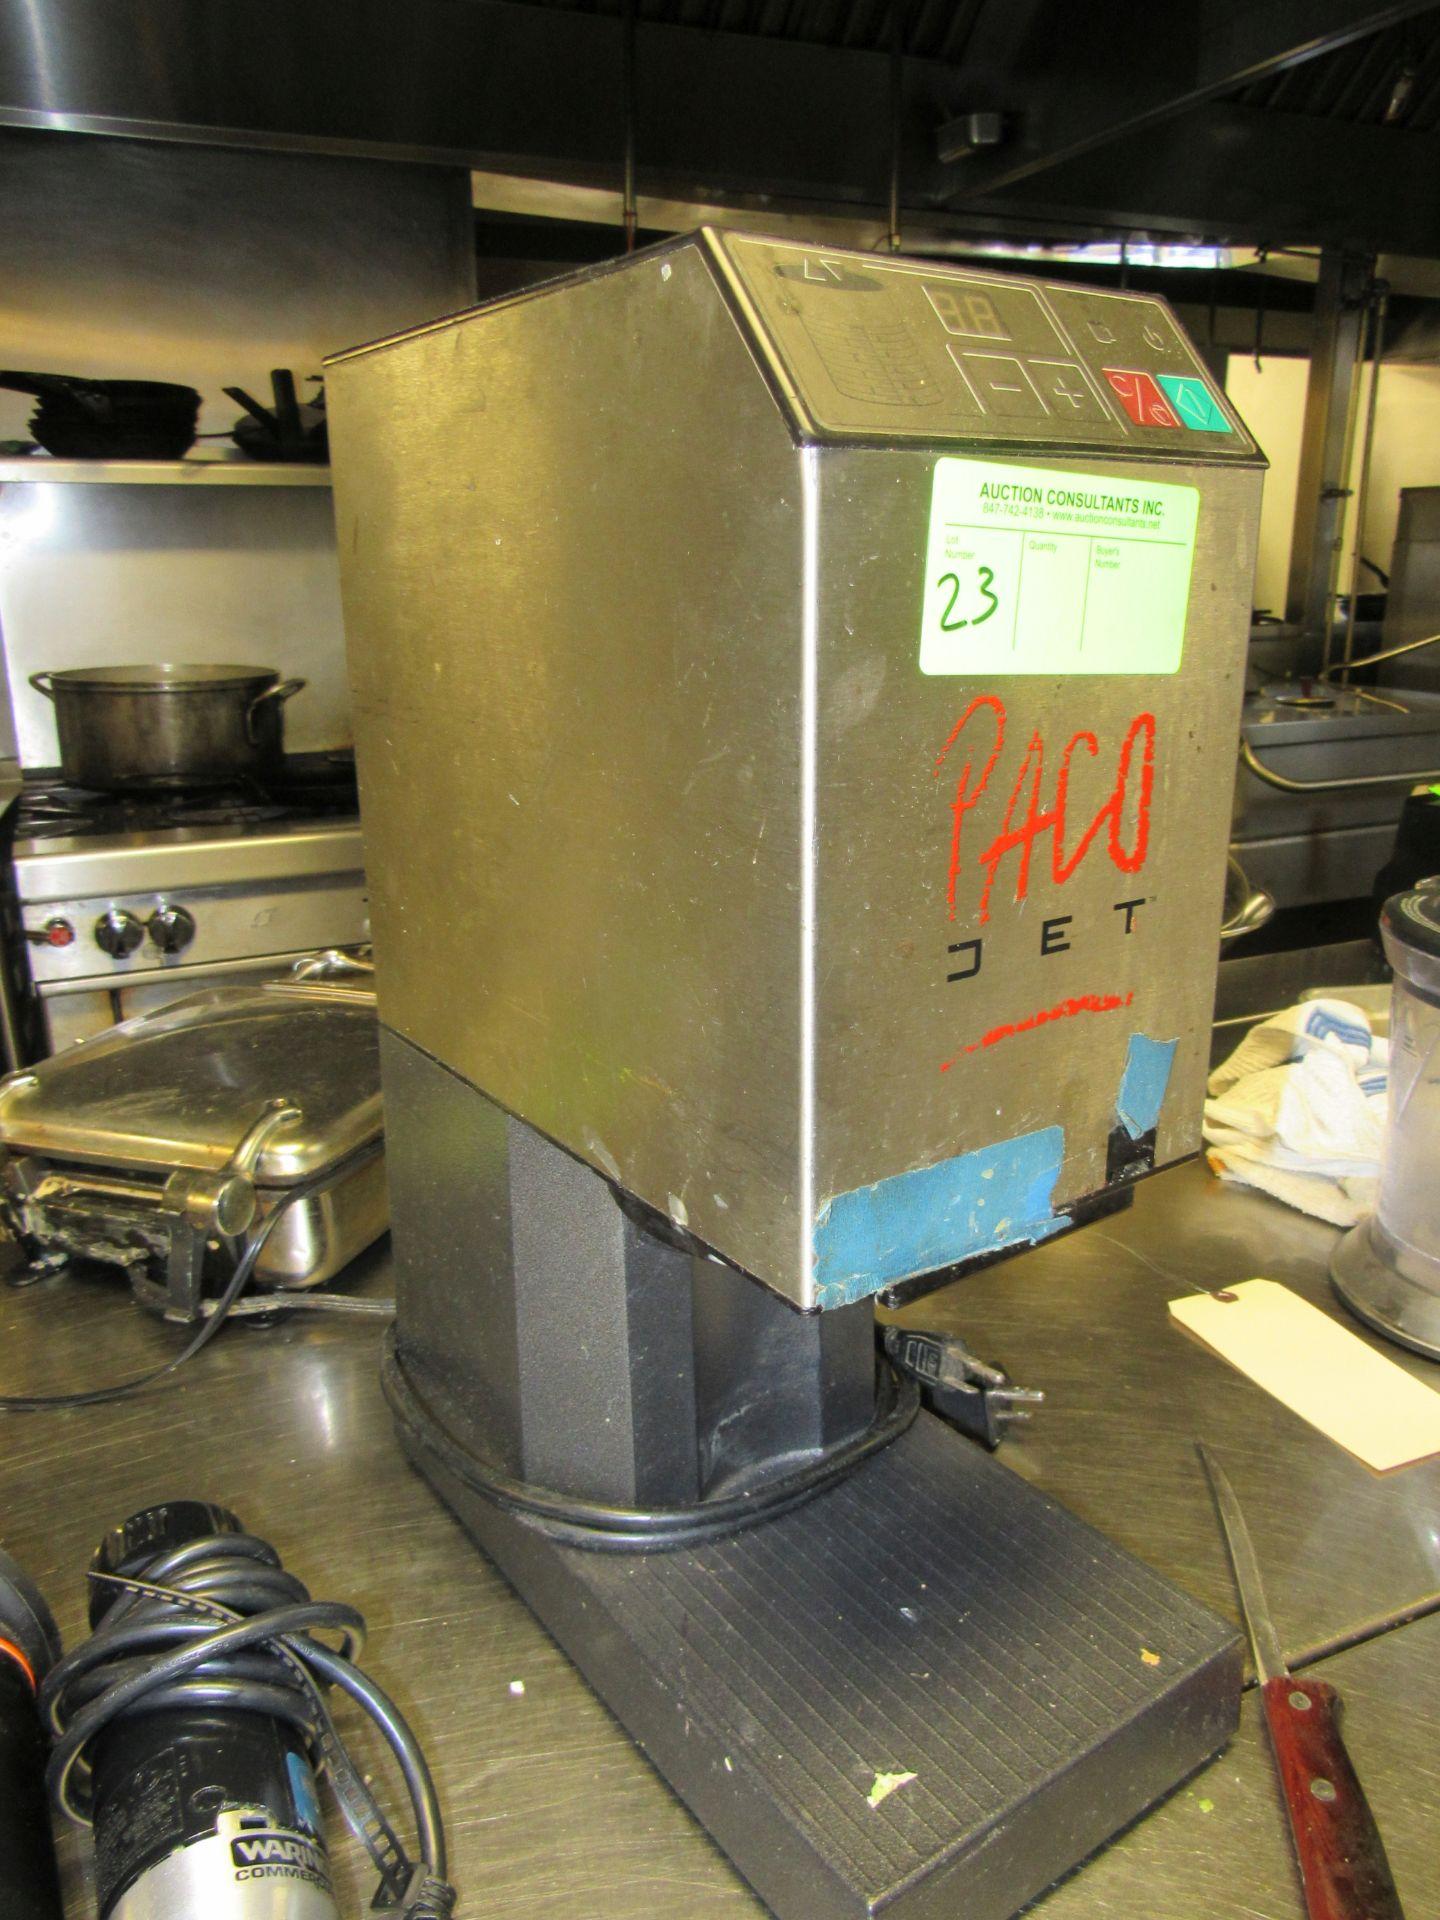 Lot 23 - Paco Jet frozen dessert system